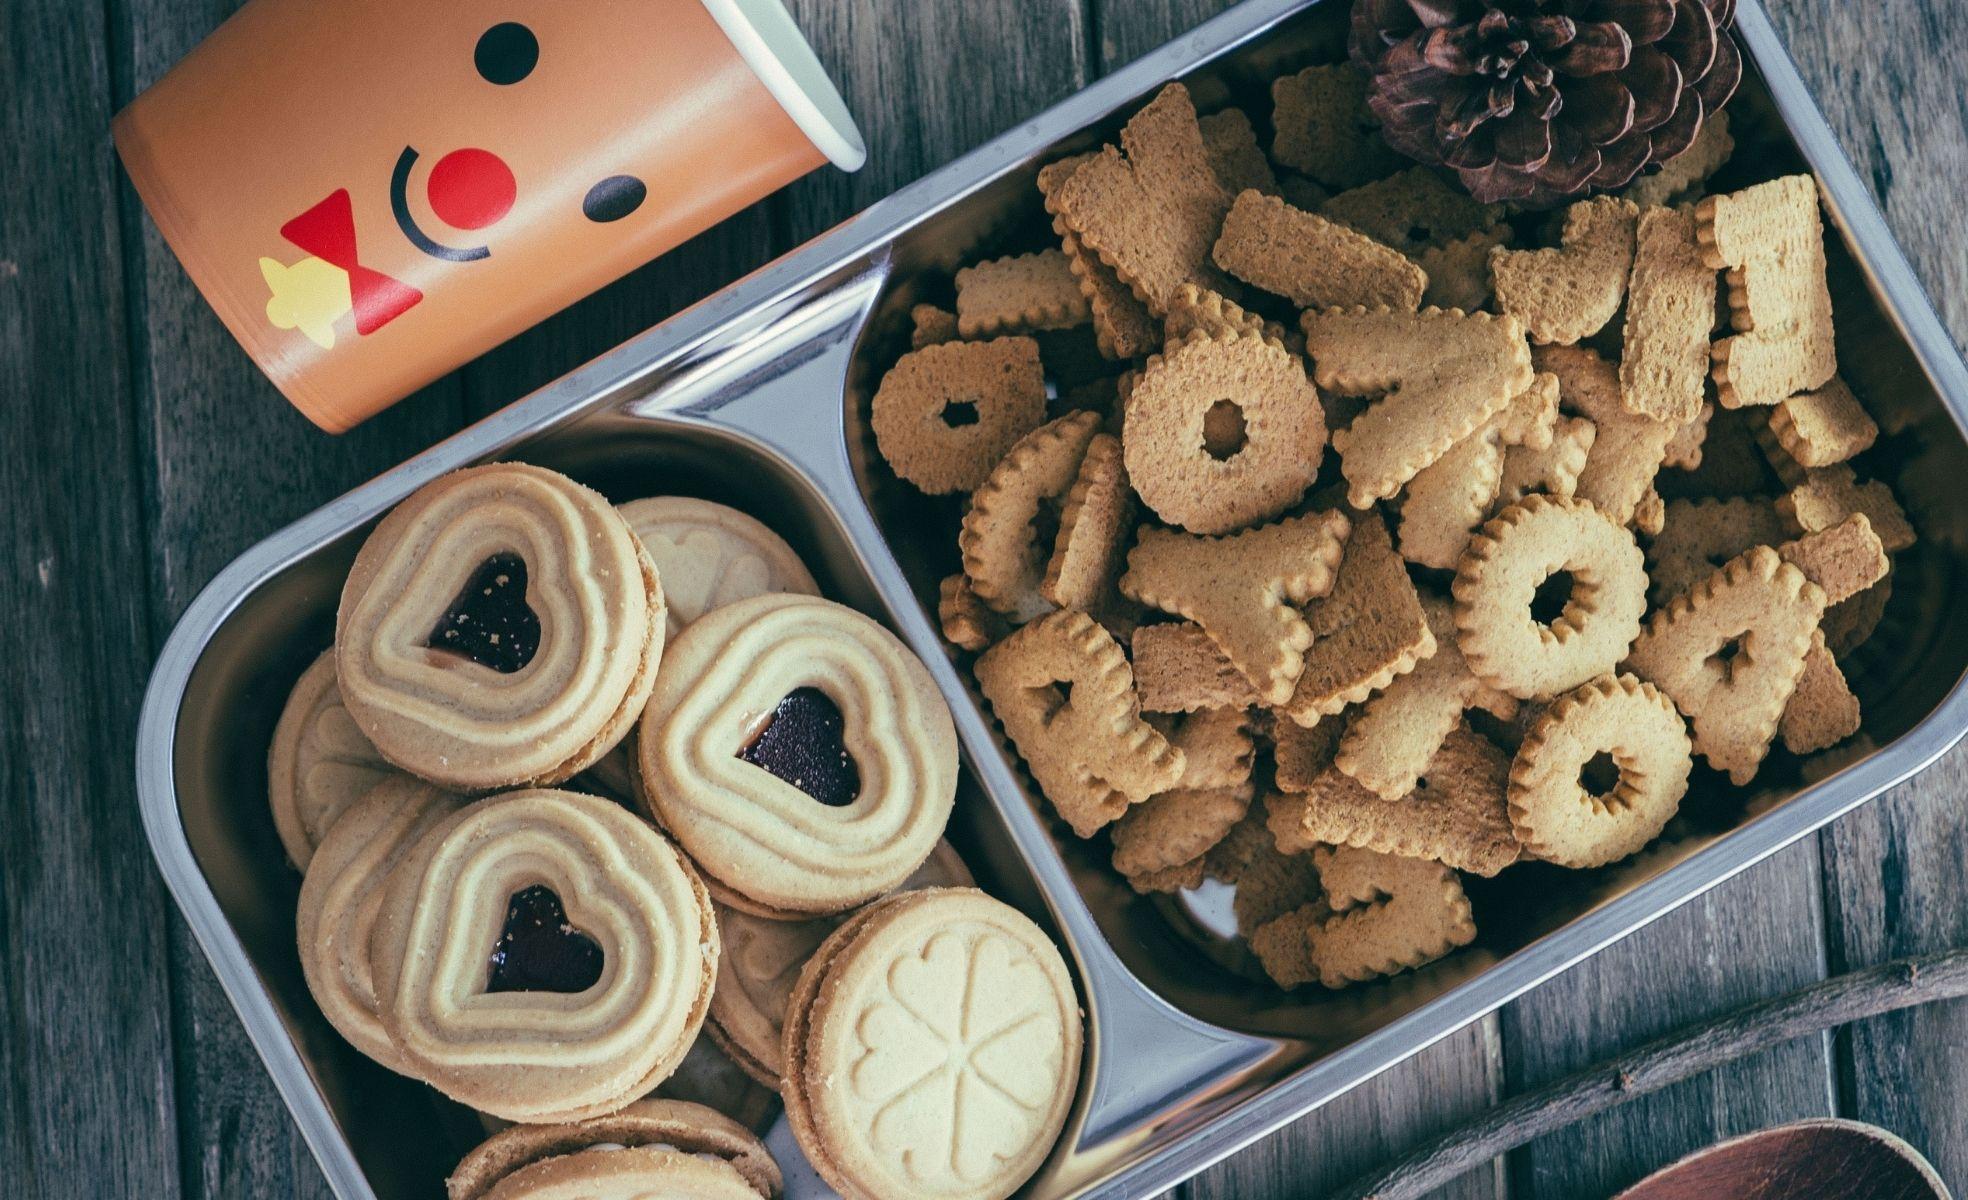 receita do dia dos namorados: cookies recheados com framboesa